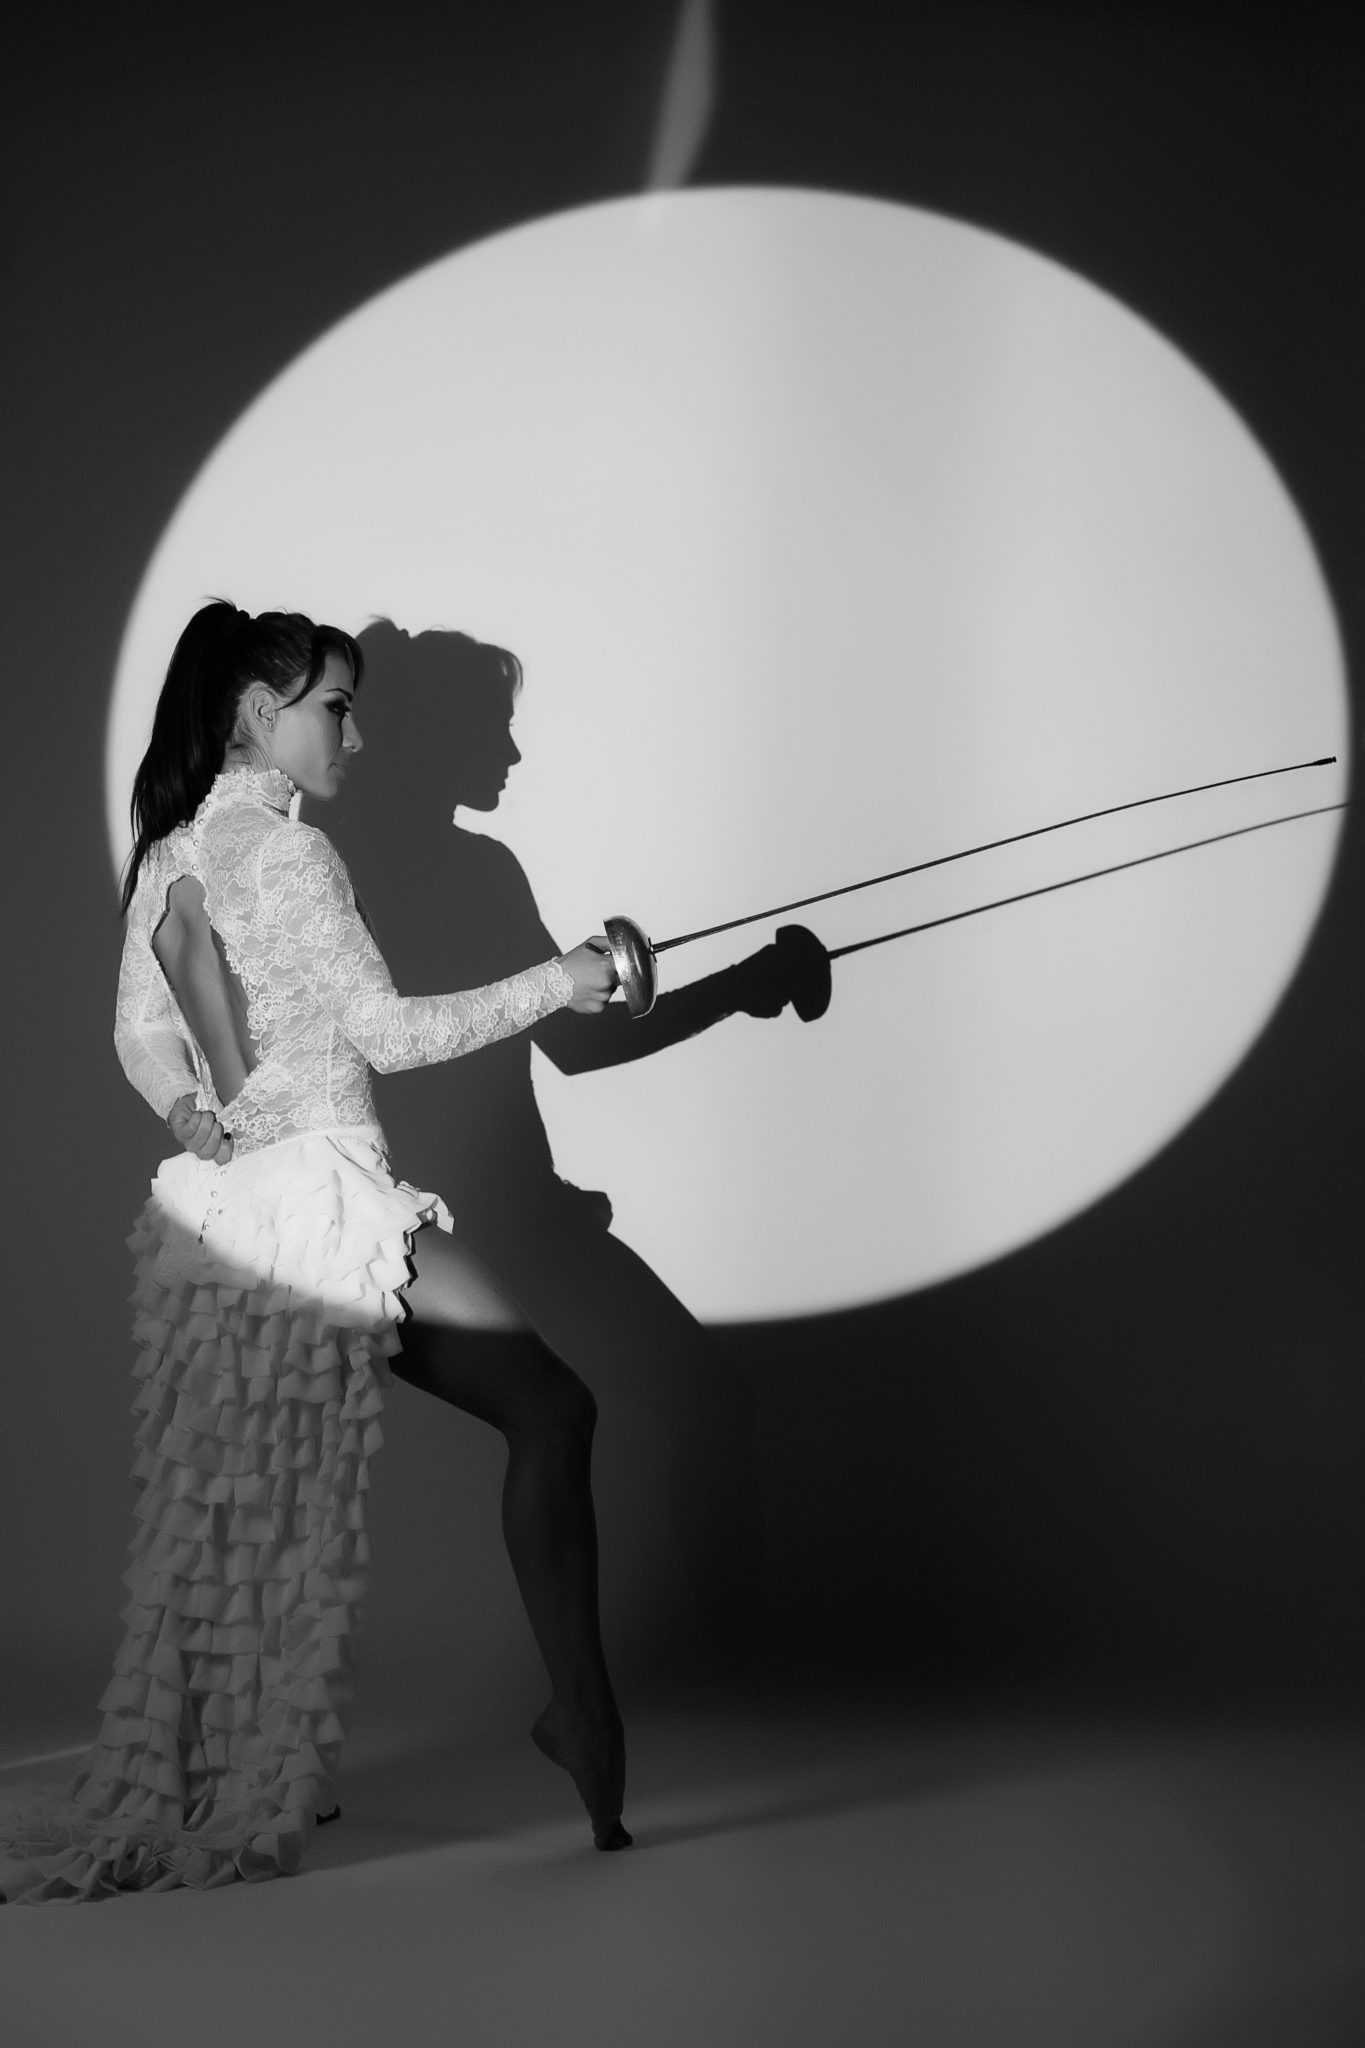 Съемка с проектором, фотосессия с проектором, чб, белый круг фон, в руках спортивная сабля